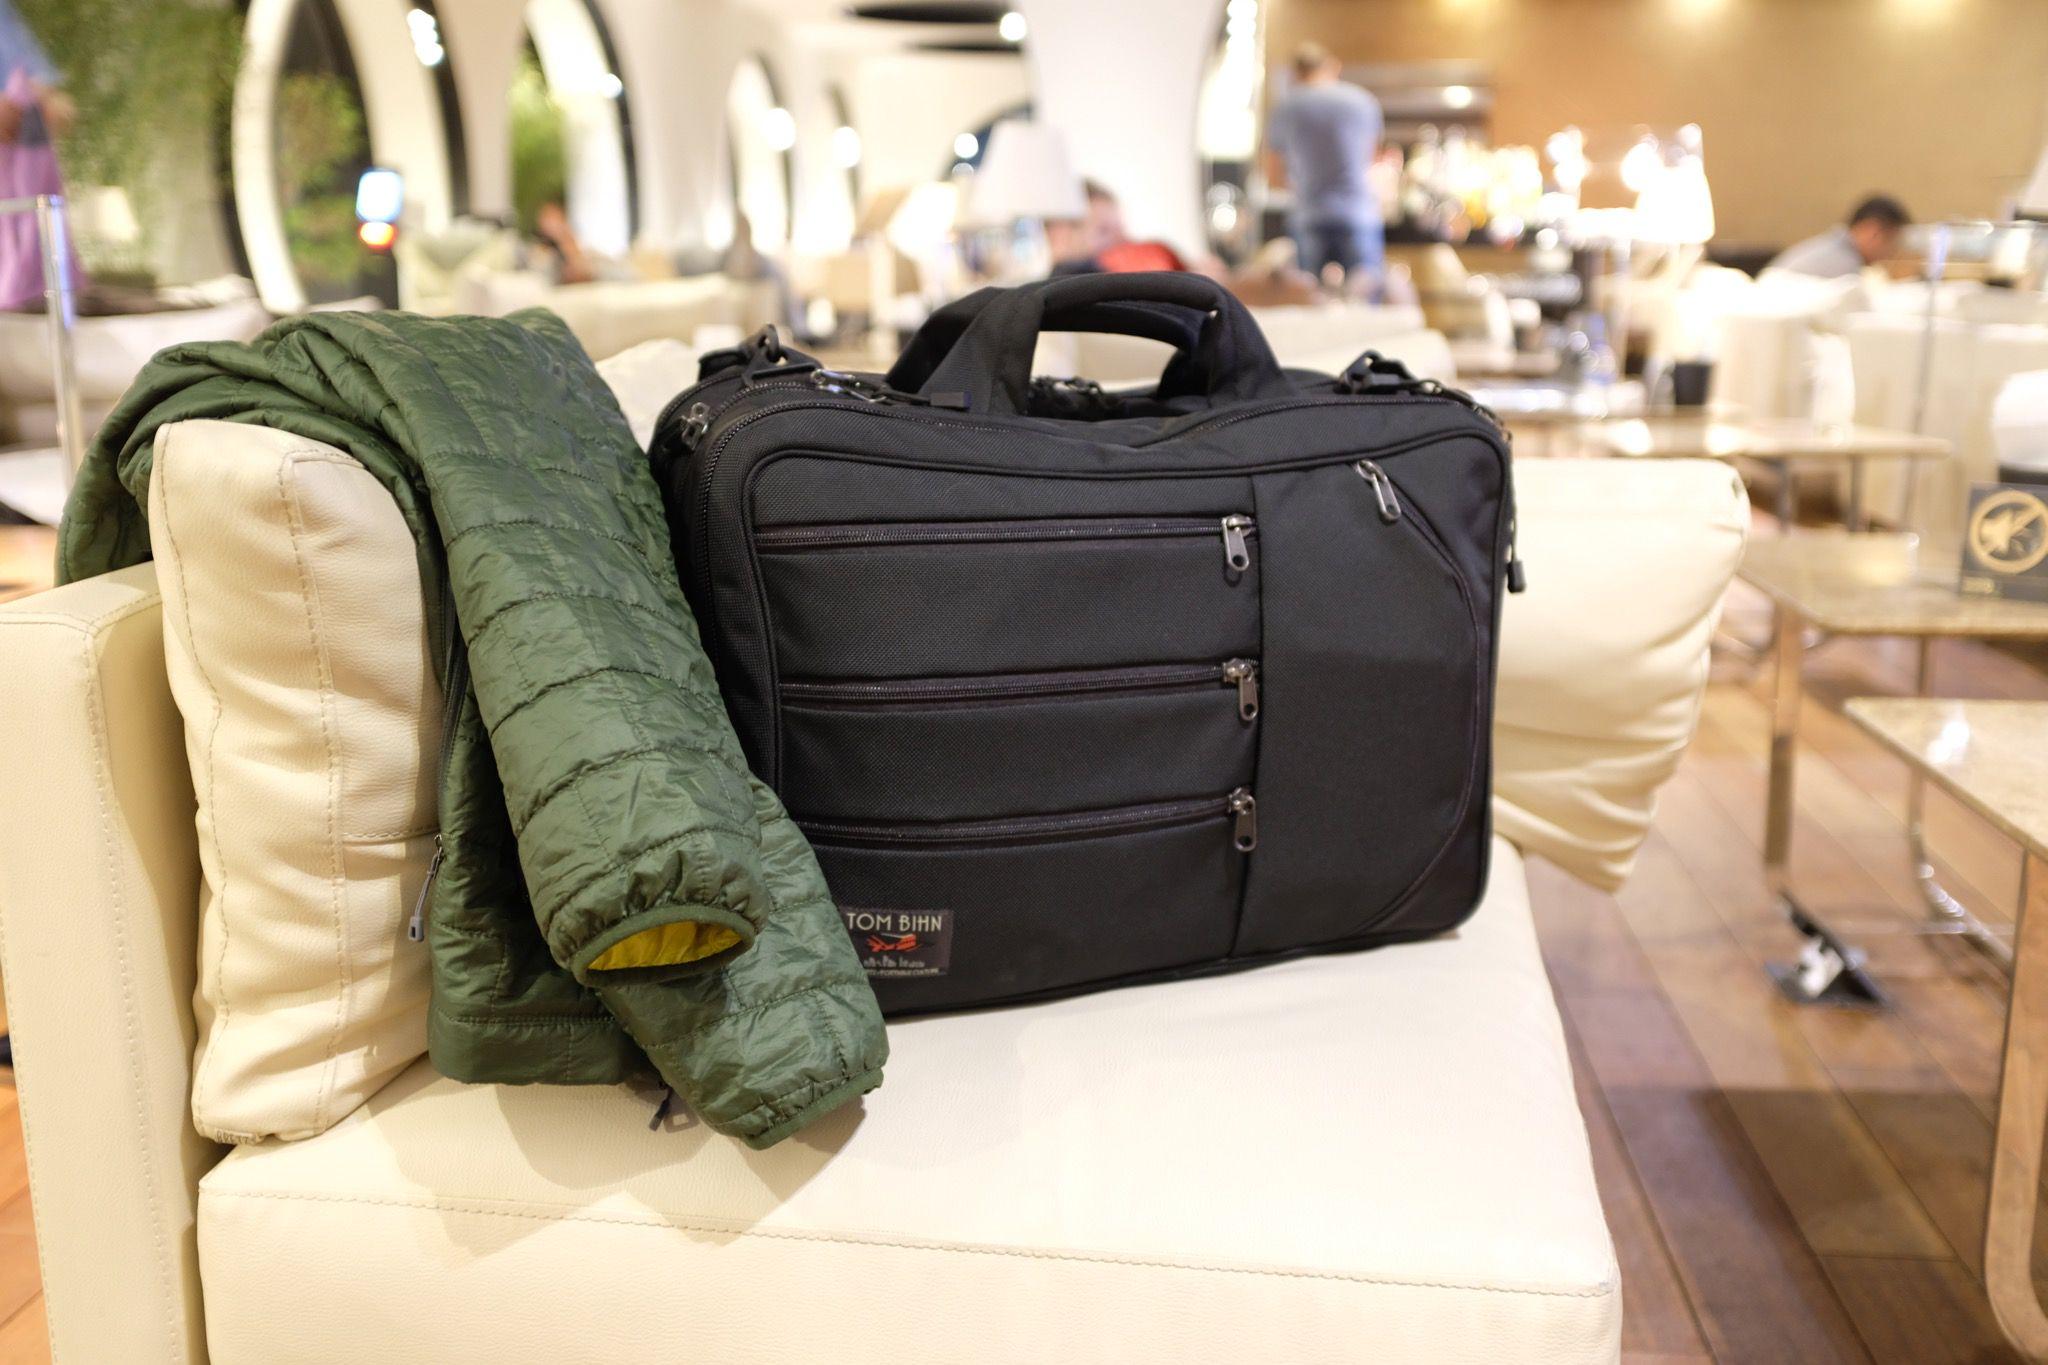 Tom Bihn Tri-Star Bag Review